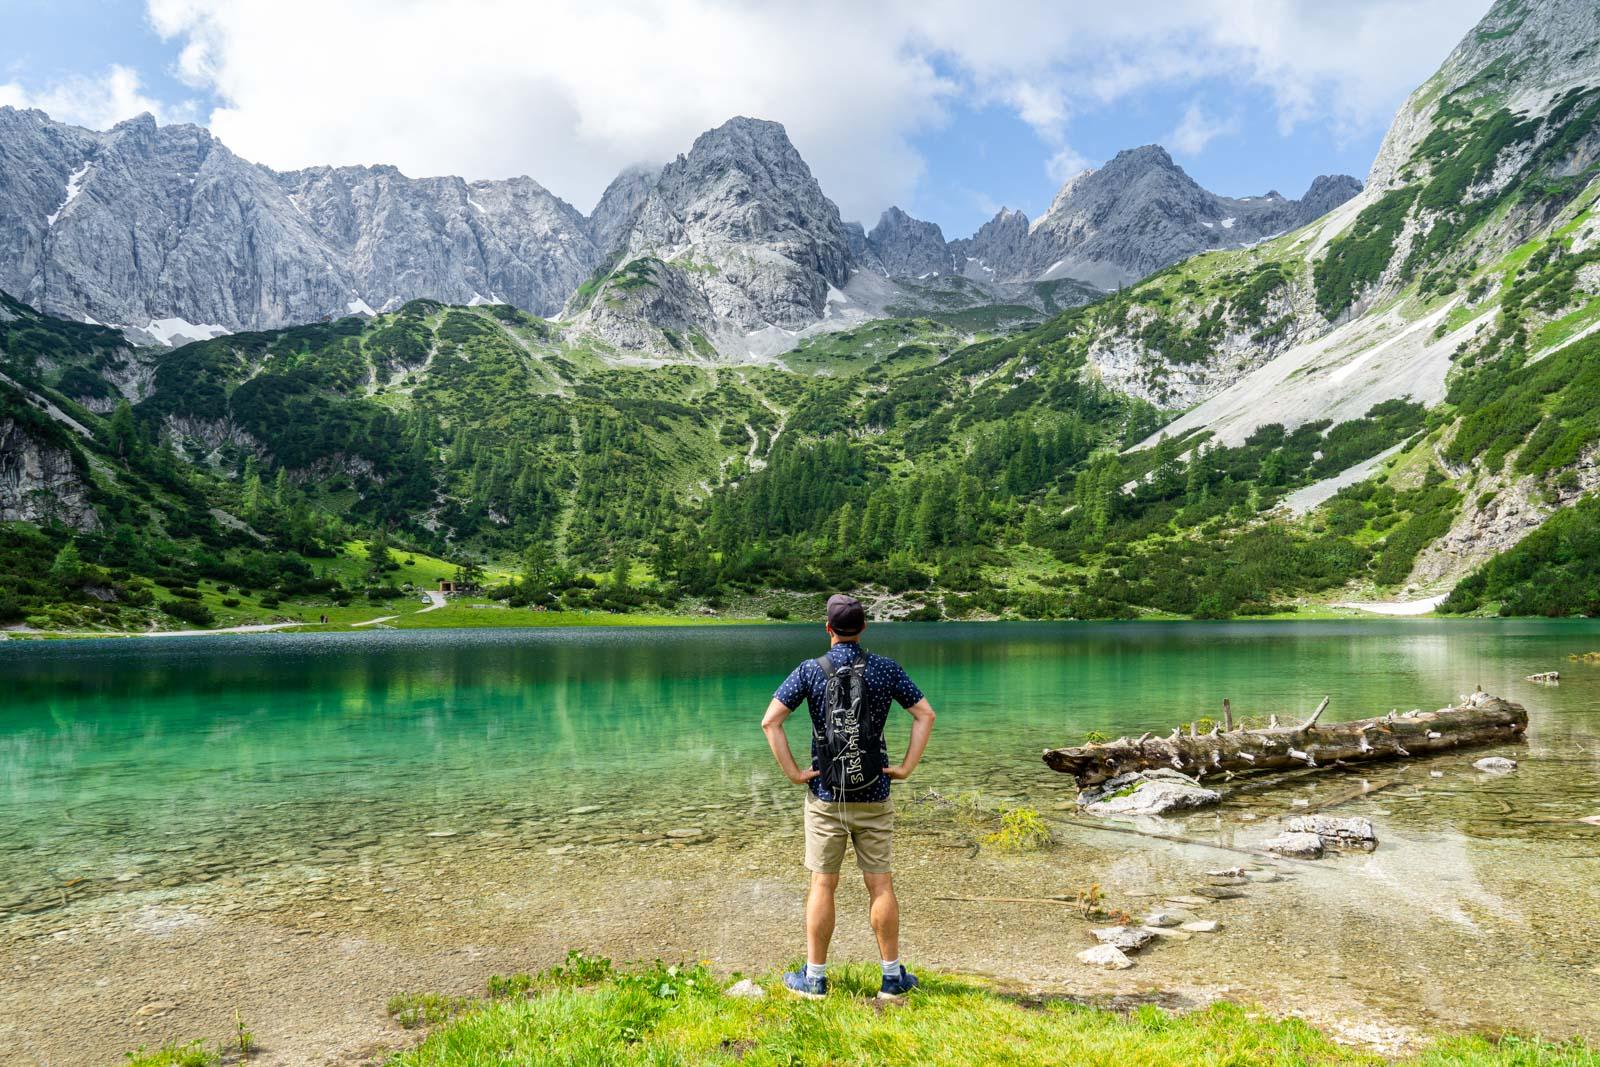 Seebensee Lake, Tirol, Austria